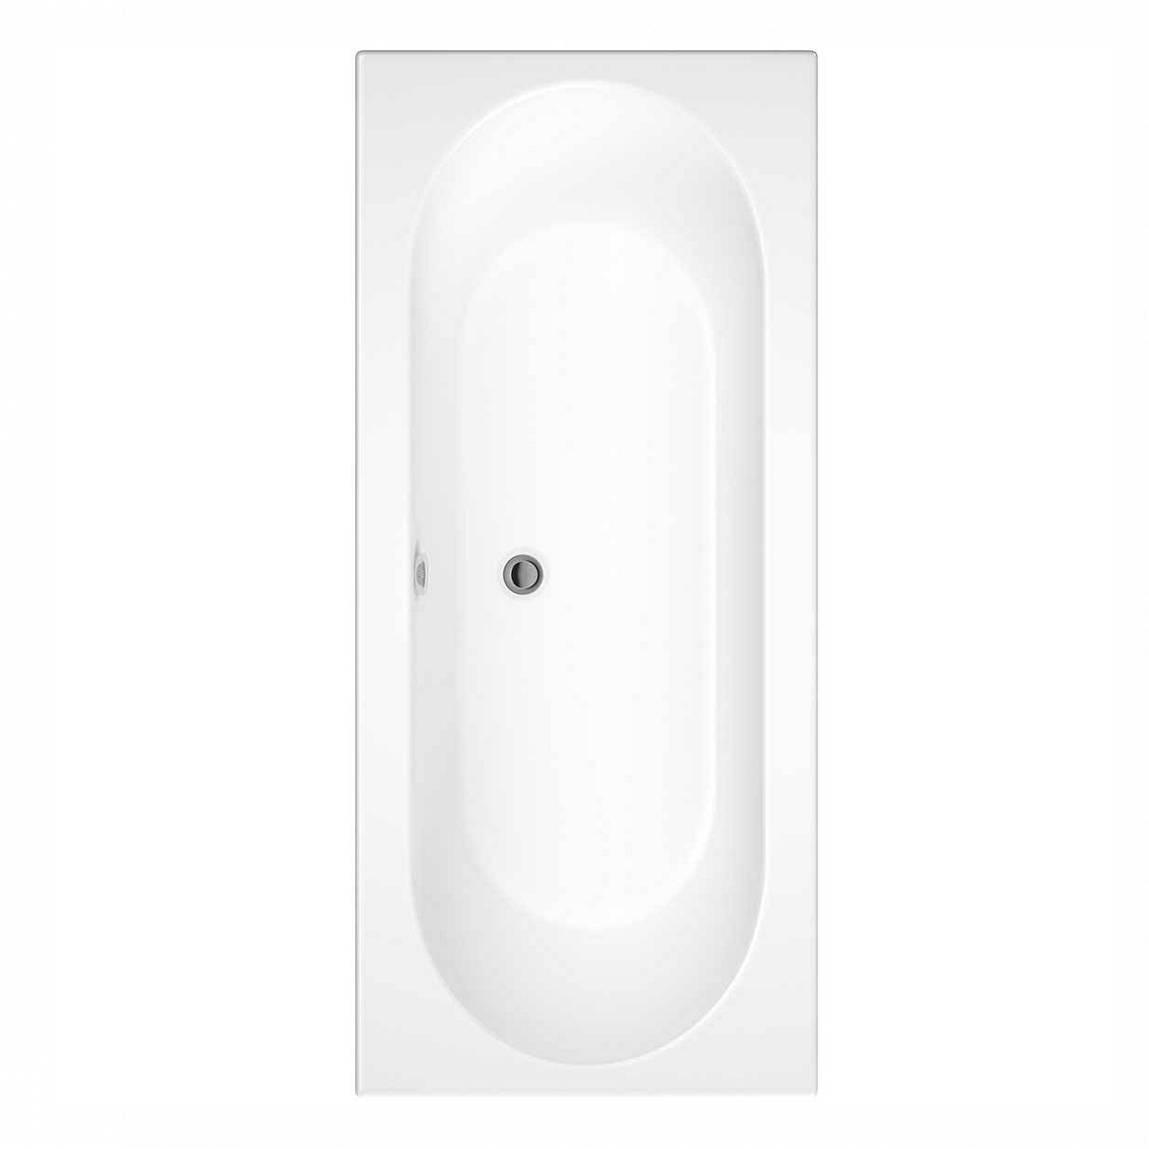 Image of Islington Bath 1700 x 700